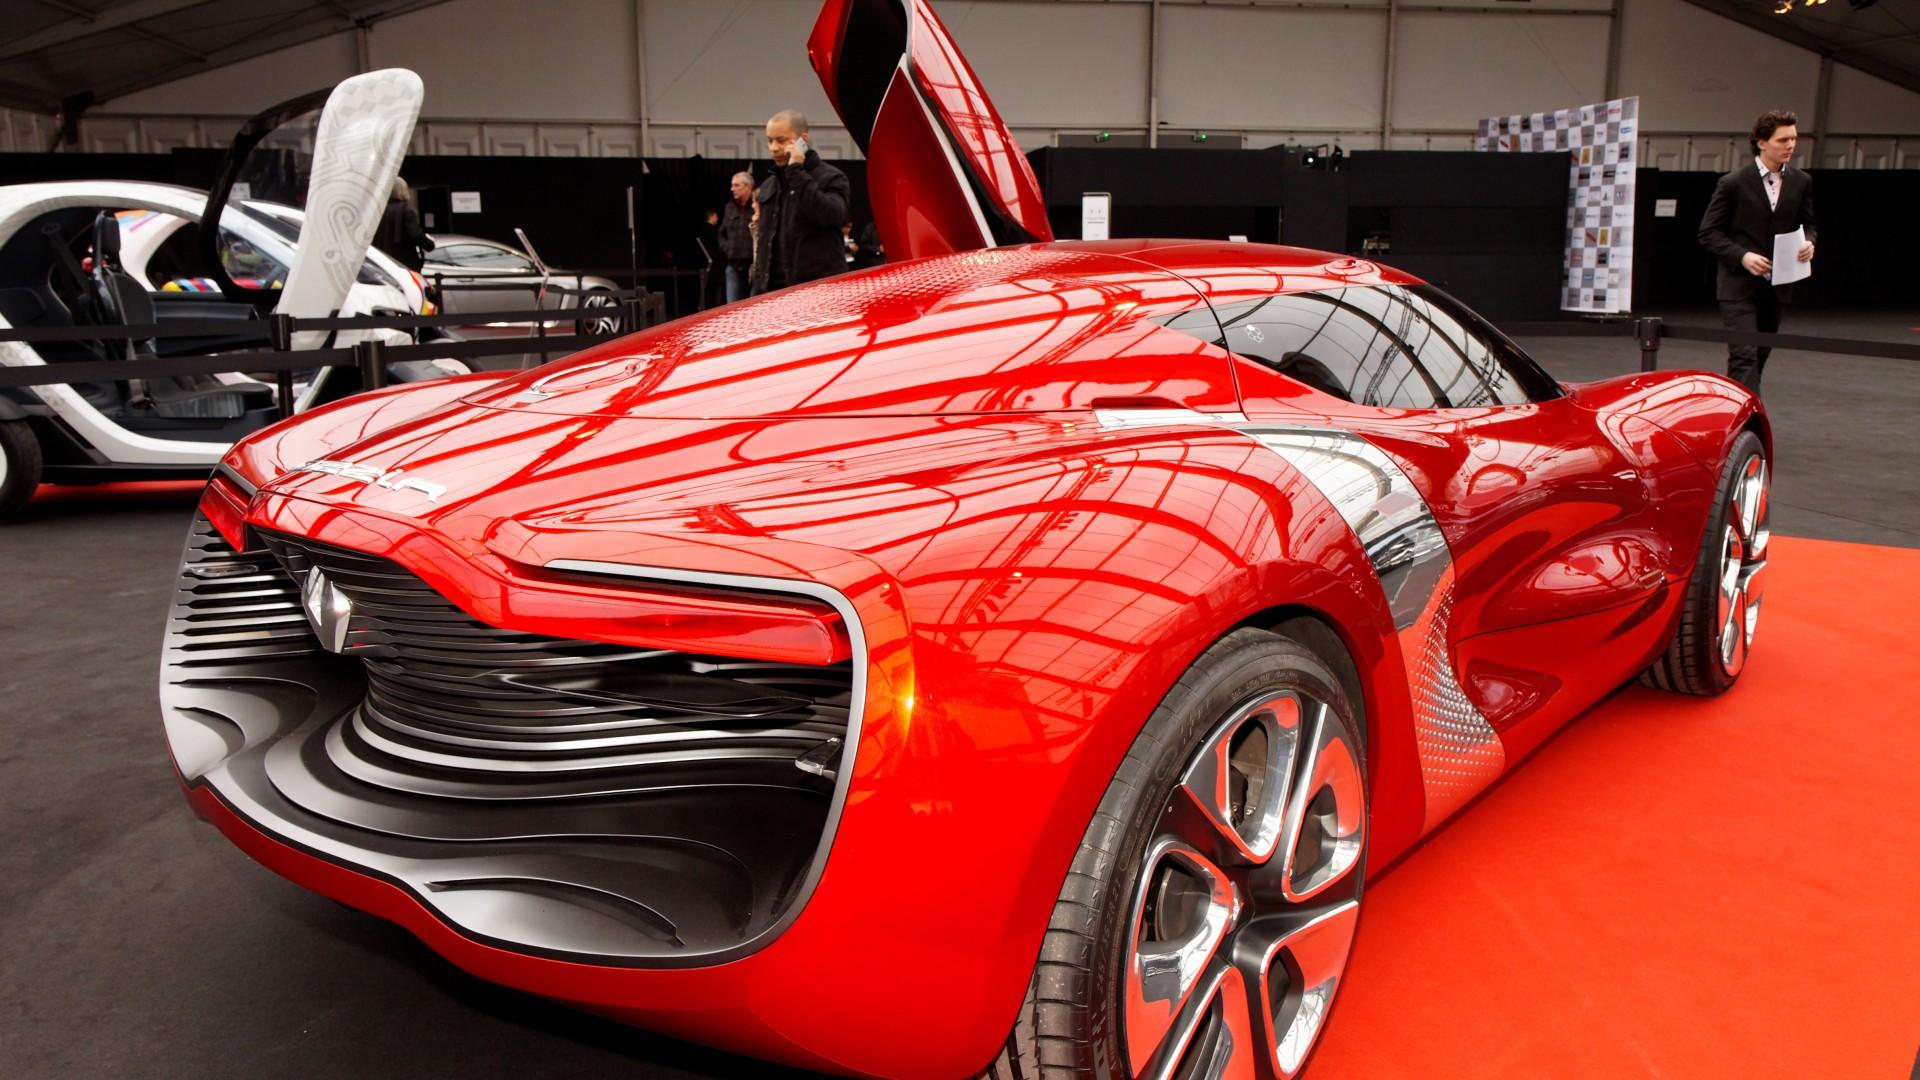 wallpaper renault dezir electric cars renault concept supercar sports car test drive. Black Bedroom Furniture Sets. Home Design Ideas